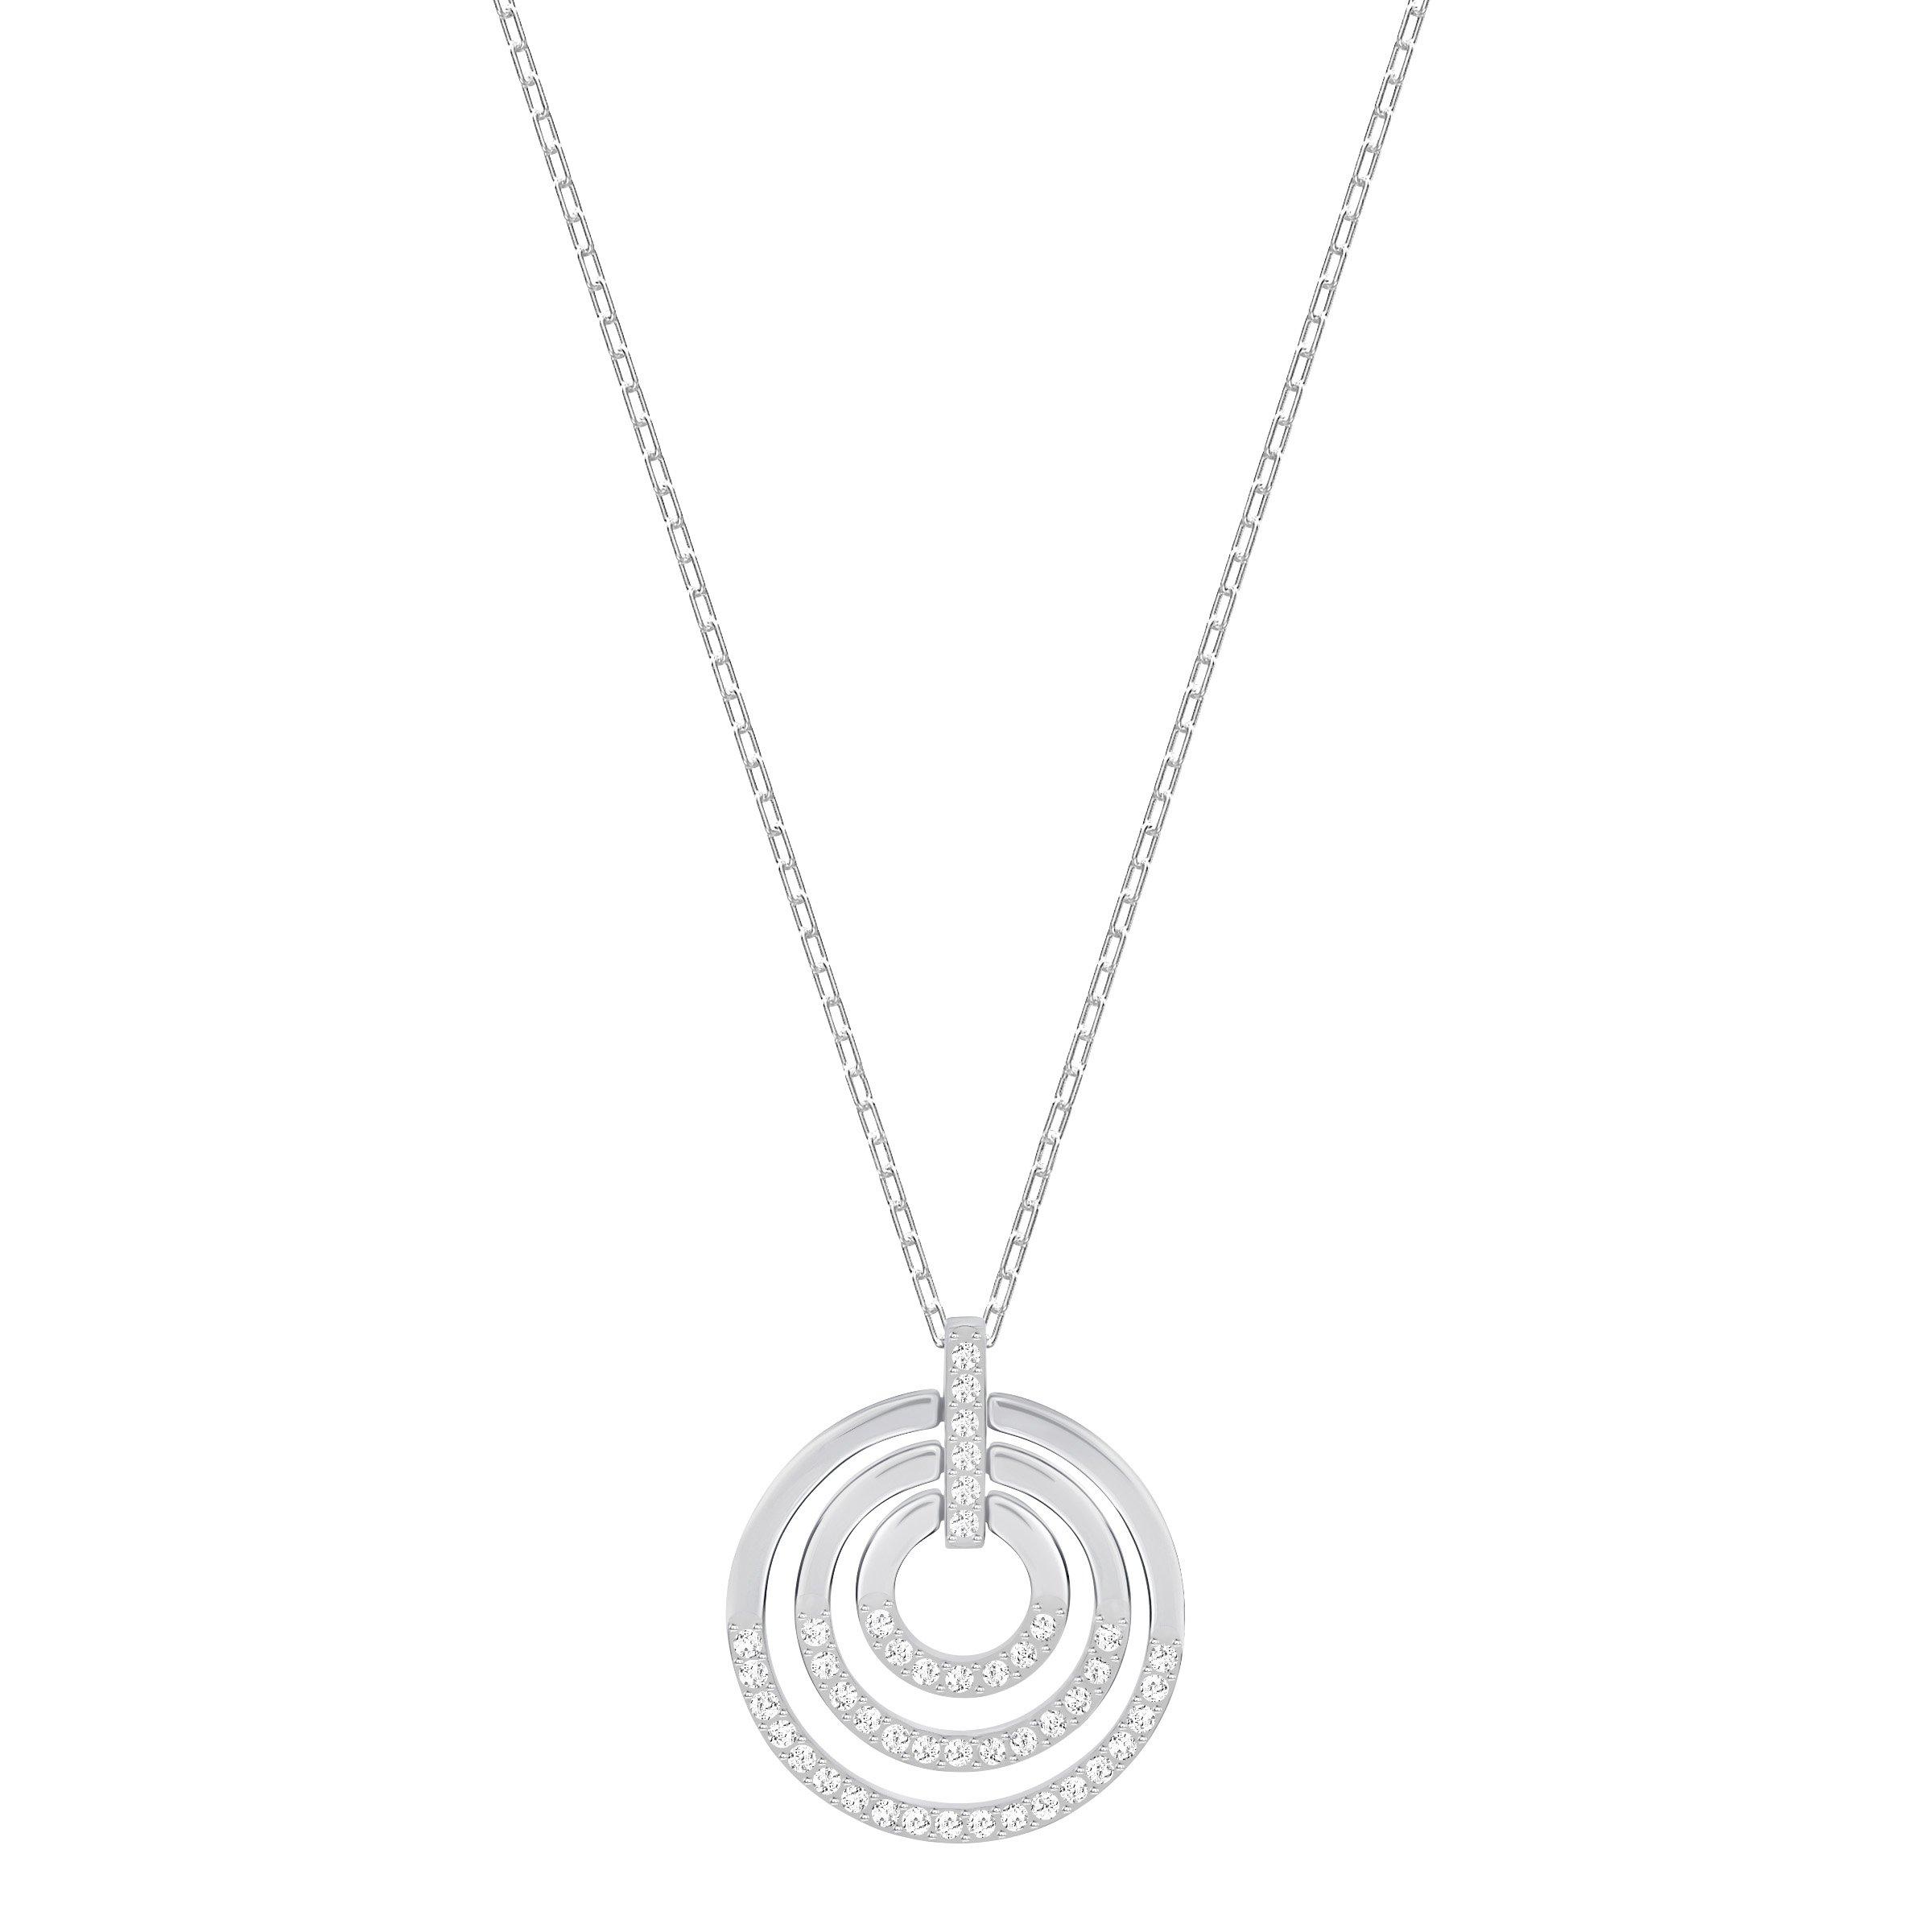 Swarovski Circle Pendant